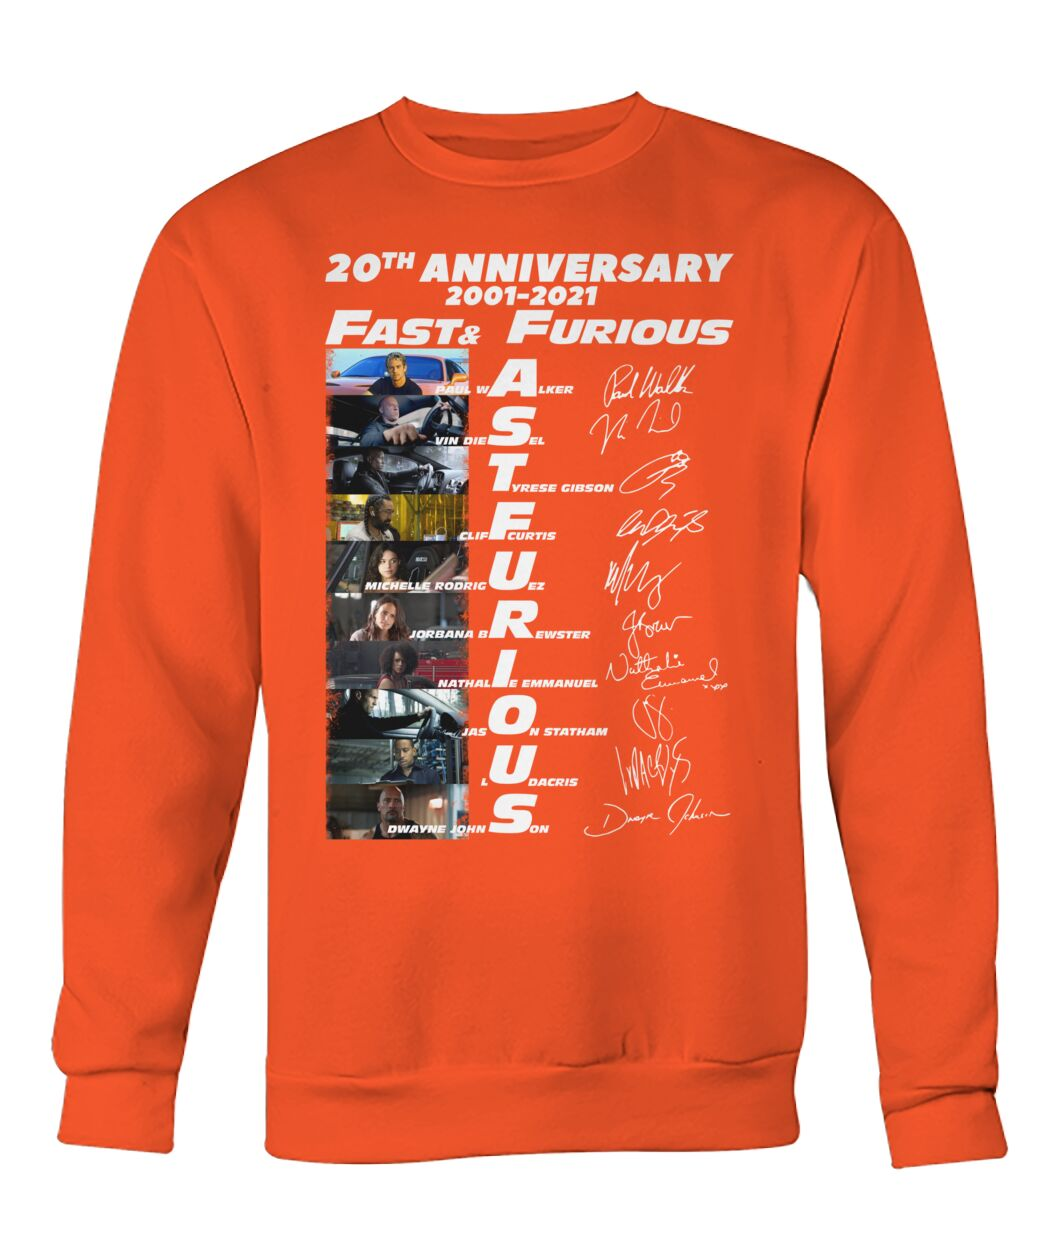 20th anniversary fast and furious sweatshirt